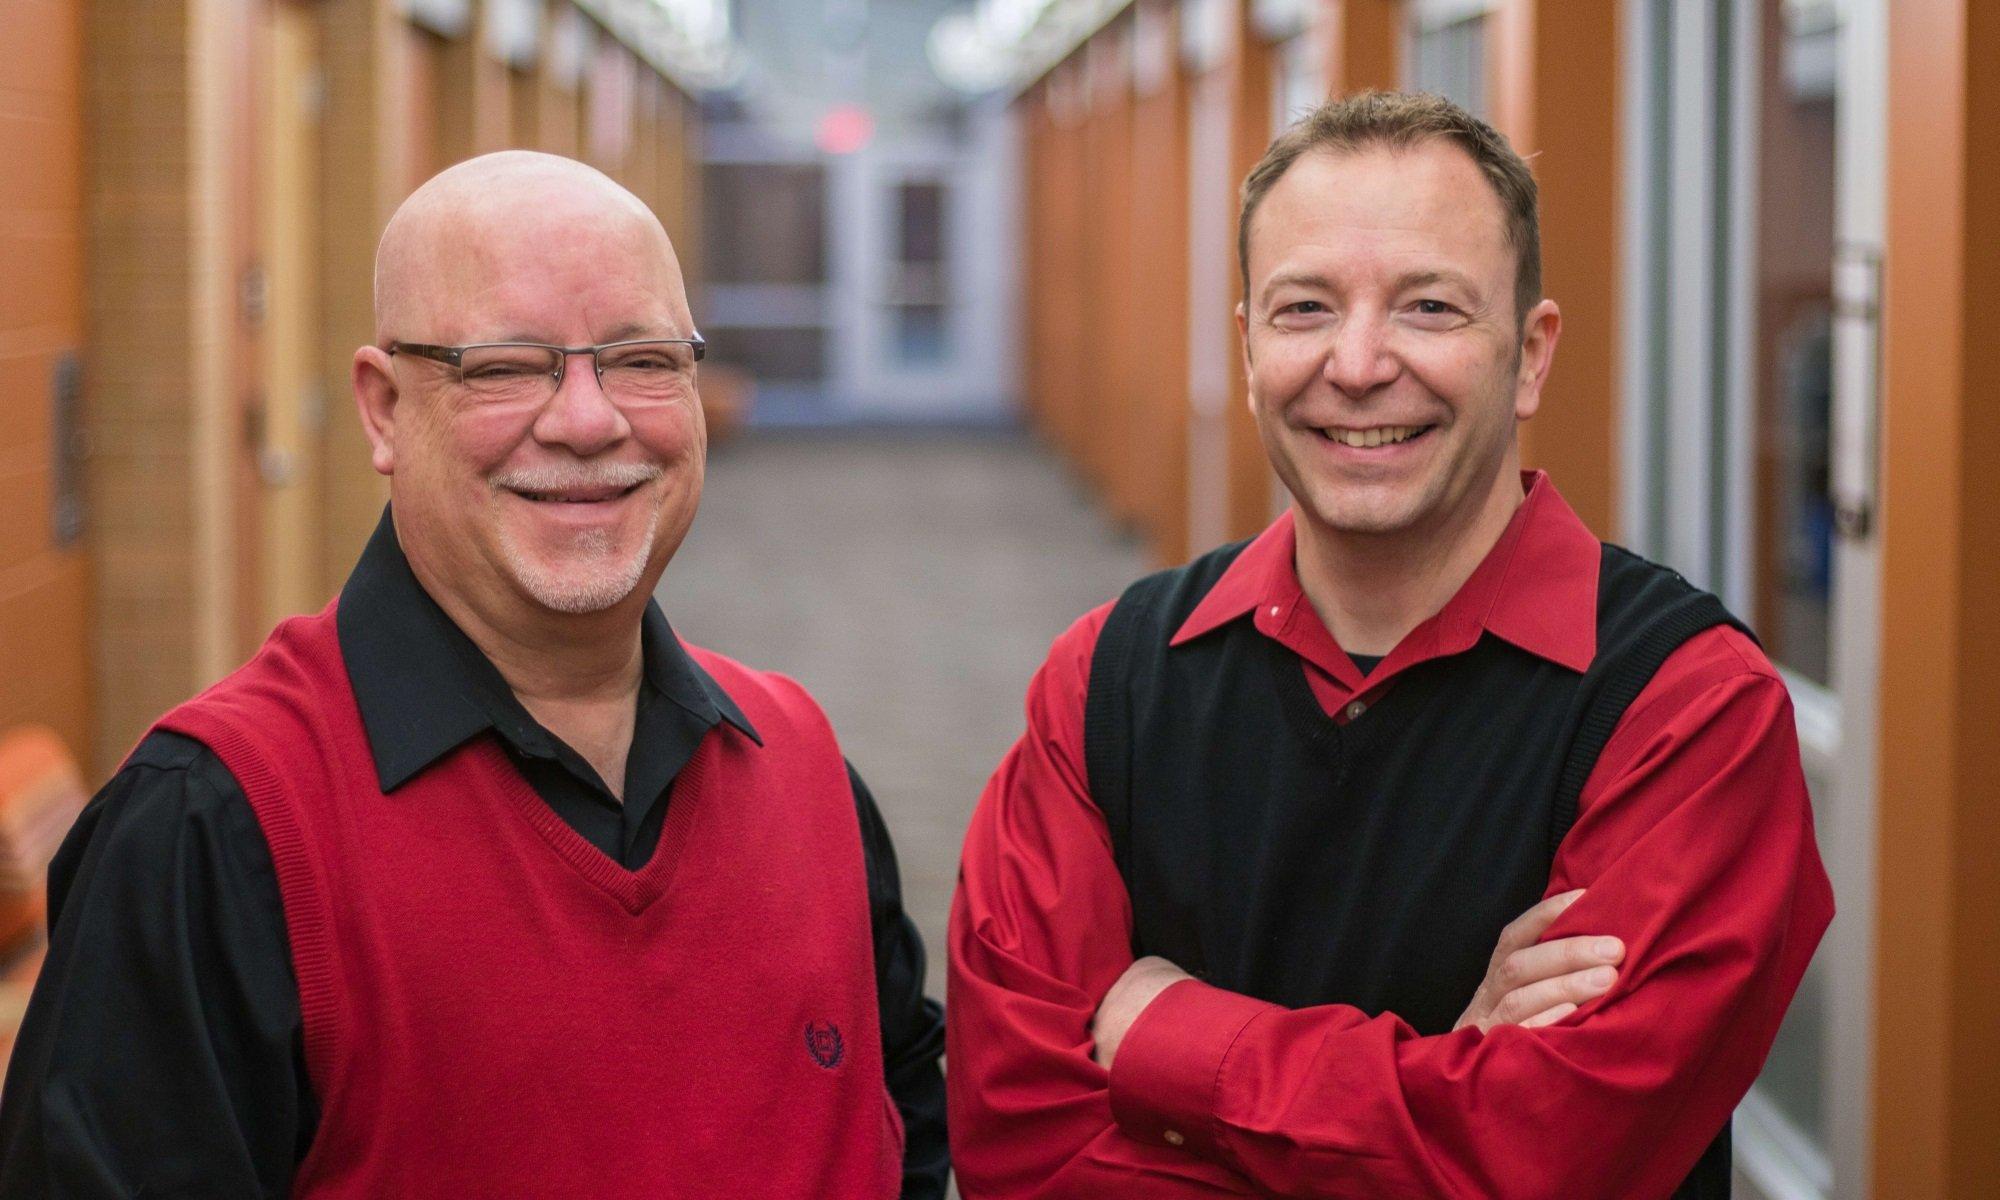 Concordia professors to lead 'Man Up' series